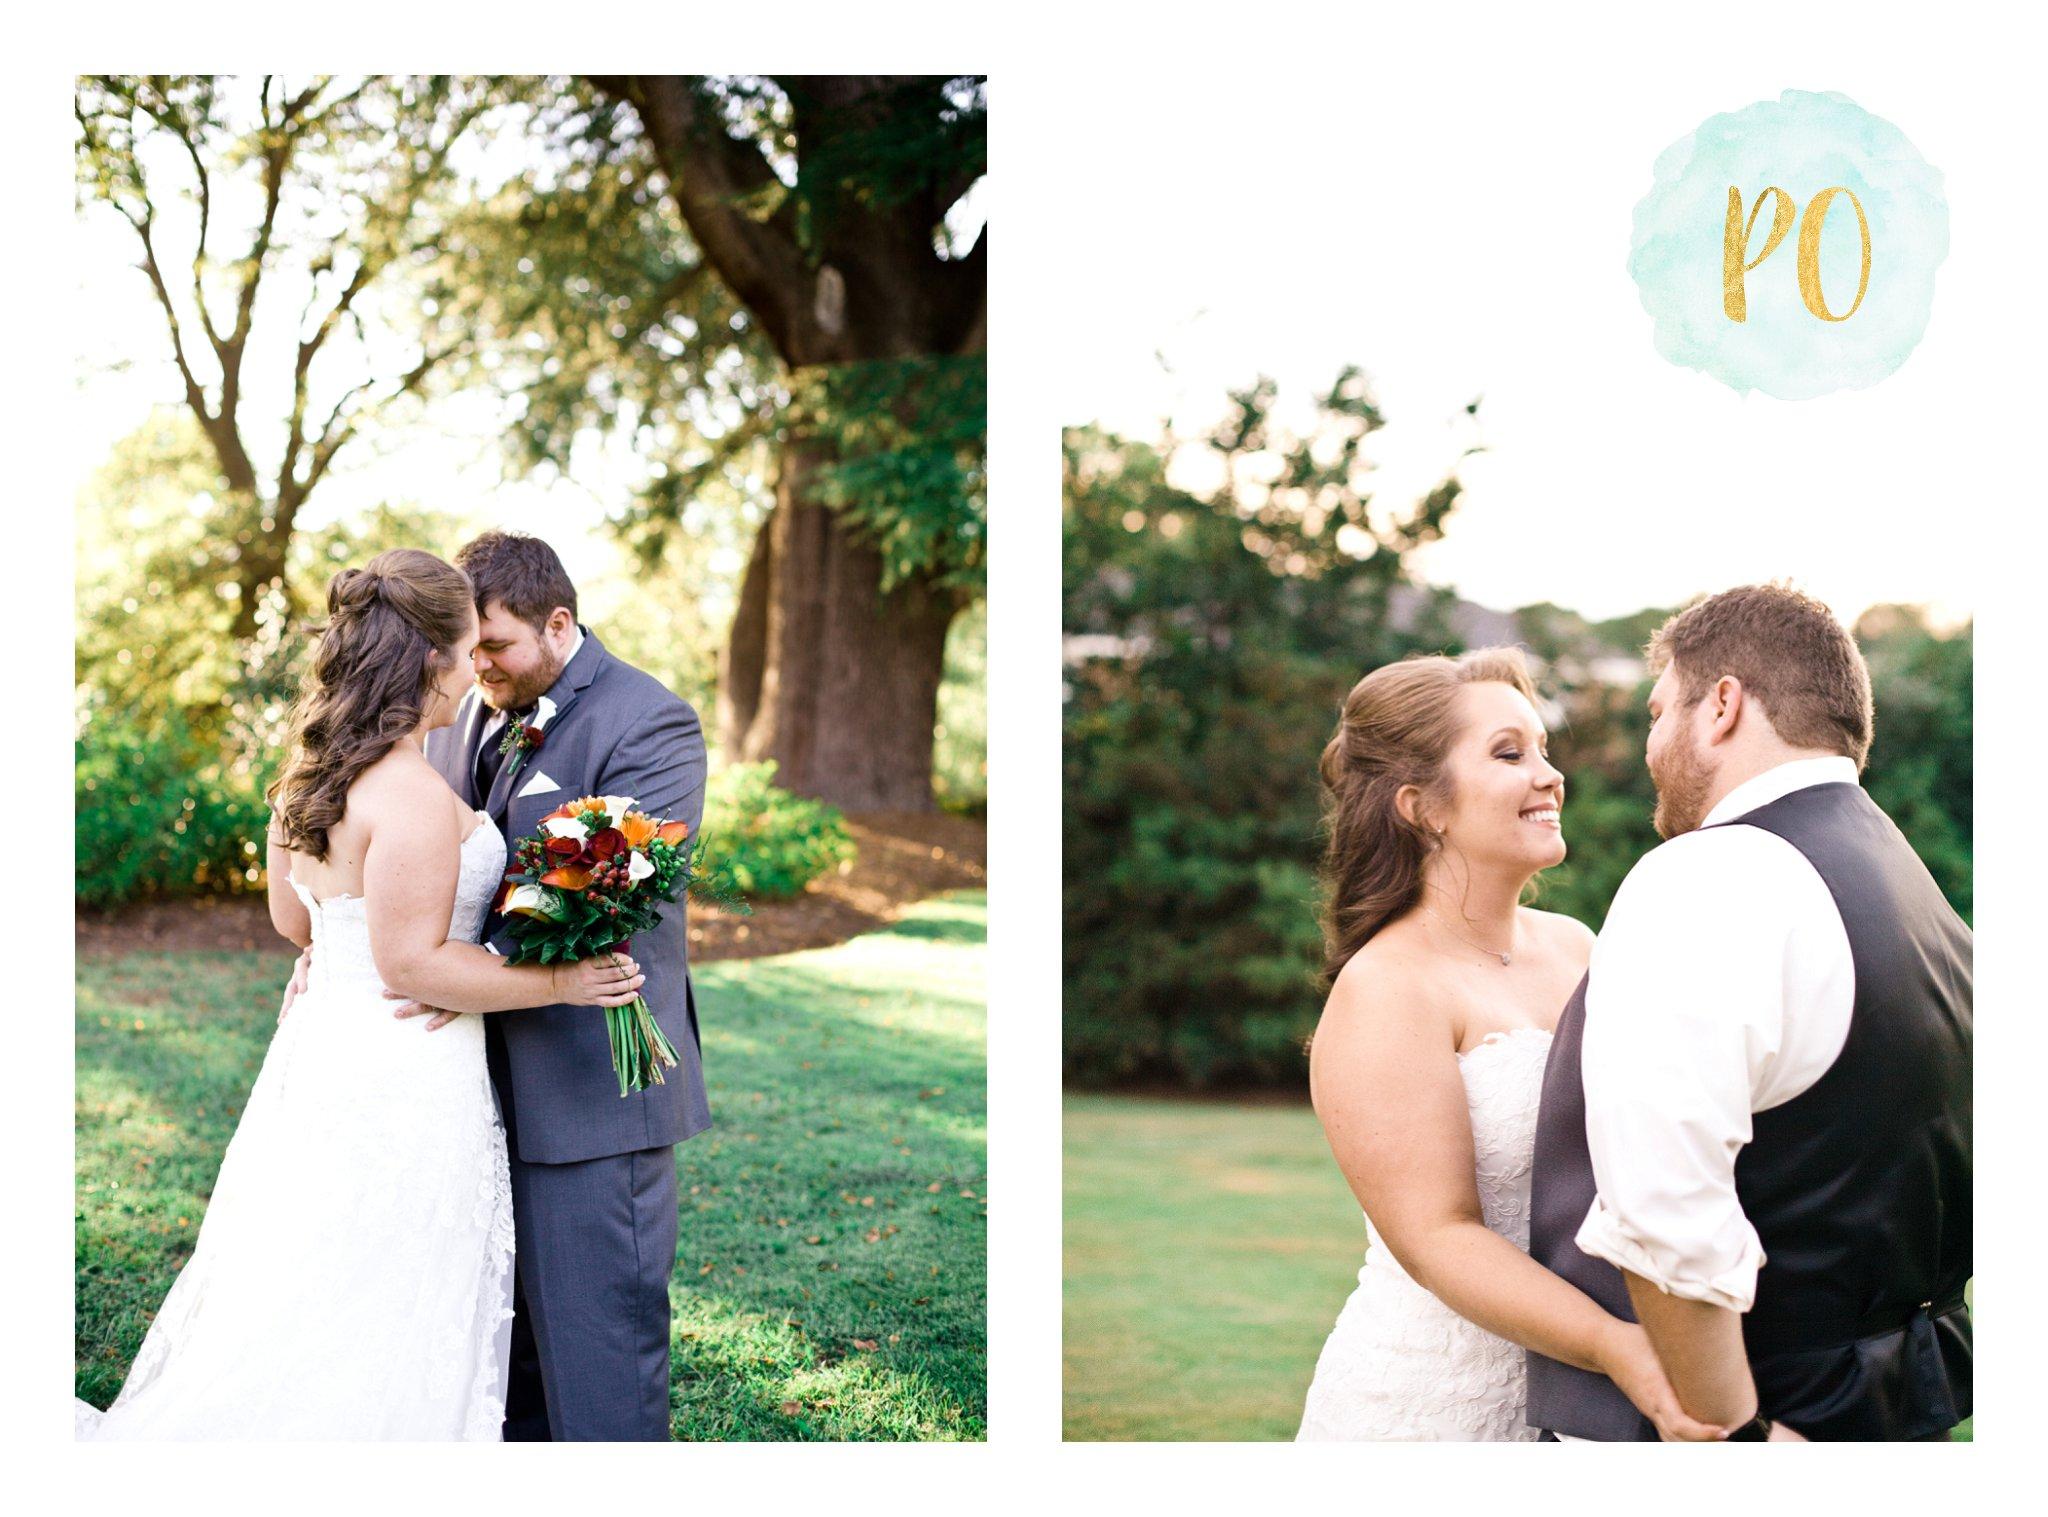 gassaway-mansion-fall-wedding-greenvile-sc-photos_0038.jpg